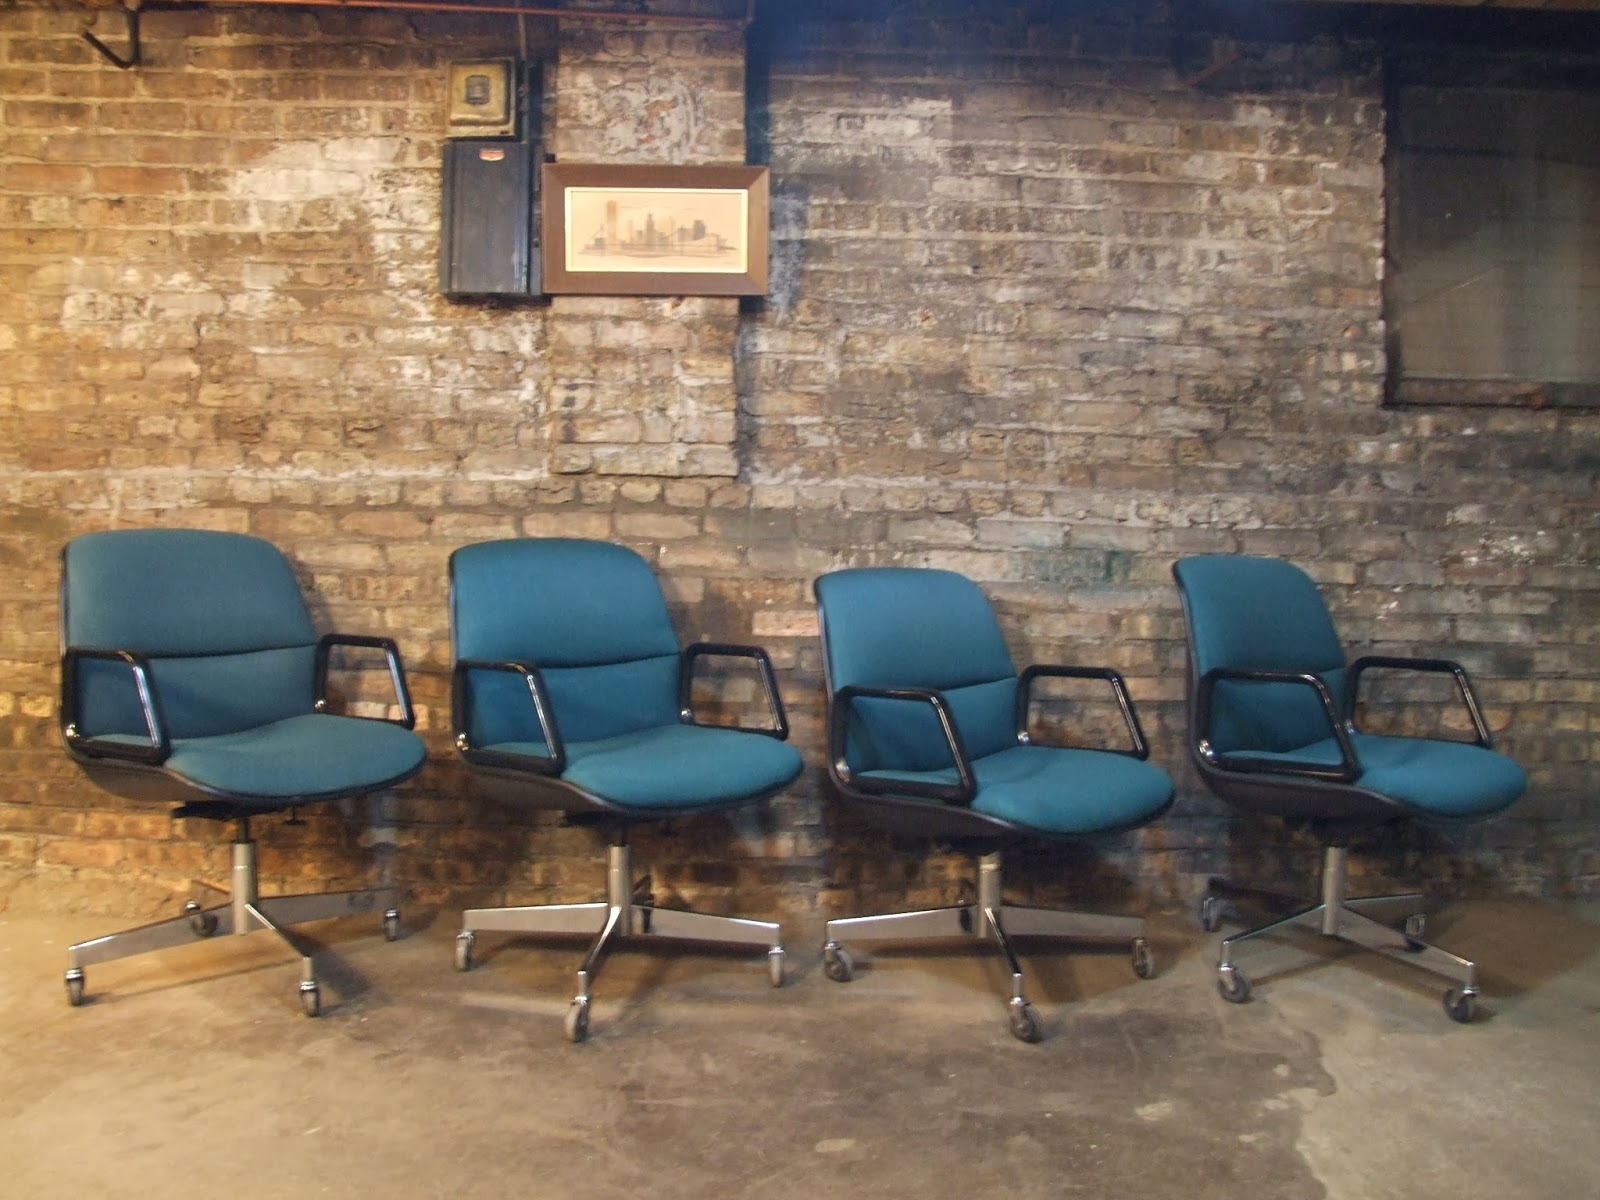 Mid Century Chicago Set of 4 AllSteel Desk Chairs